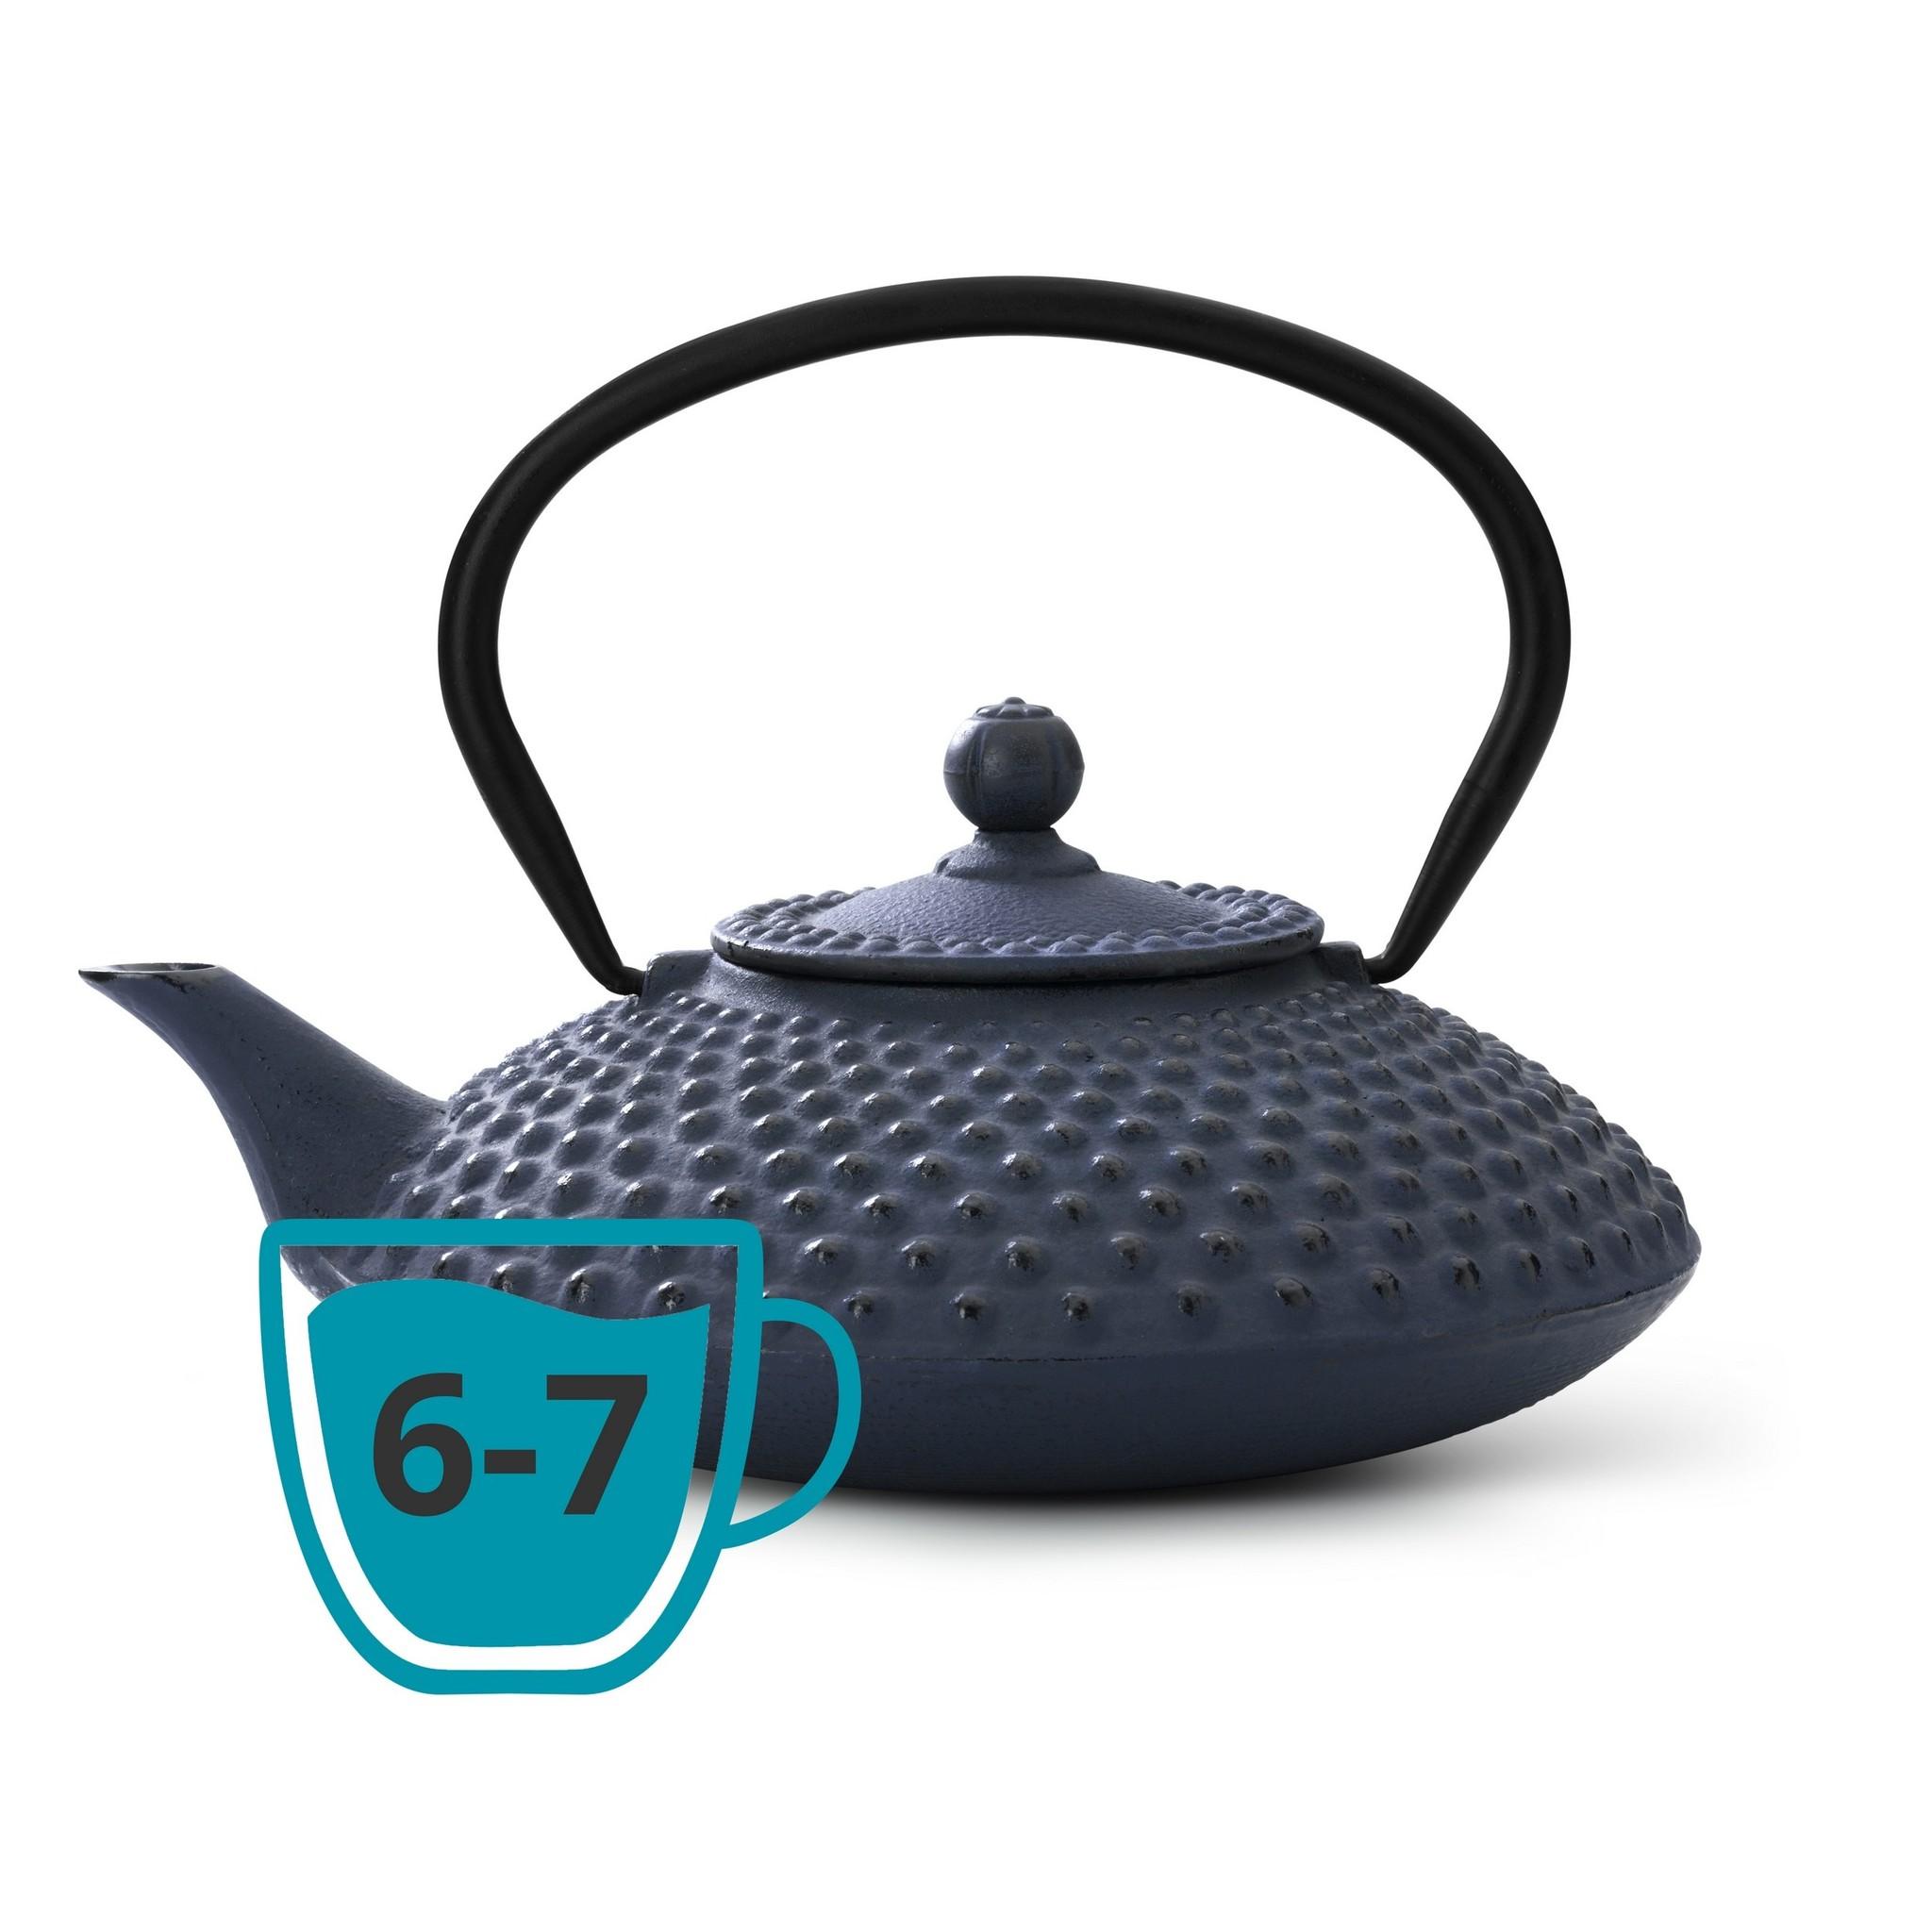 Bredemeijer Theepot Xilin 1.25 L gietijzer blauw